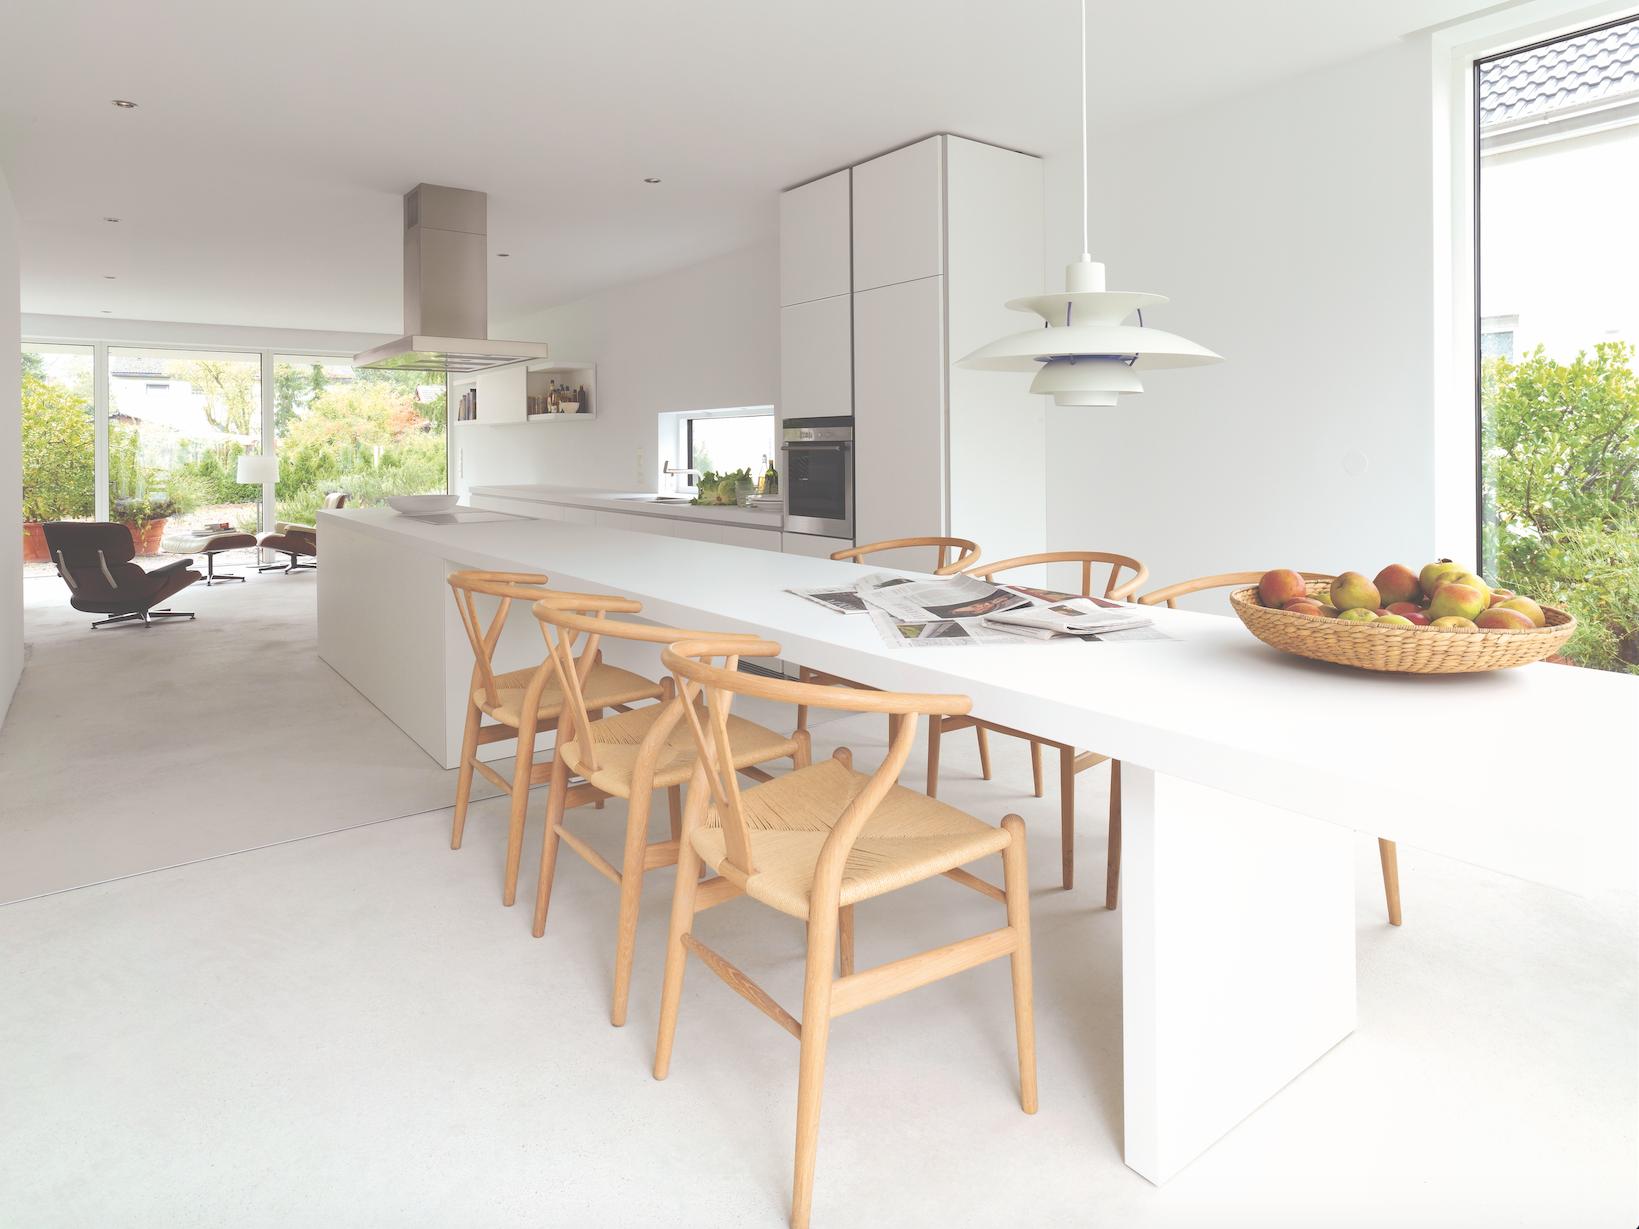 Meuble Ilot Central Table ~ Bulthaup B1 Keuken Het Werkblad Van Het Bulthaup B1 Keukeneiland